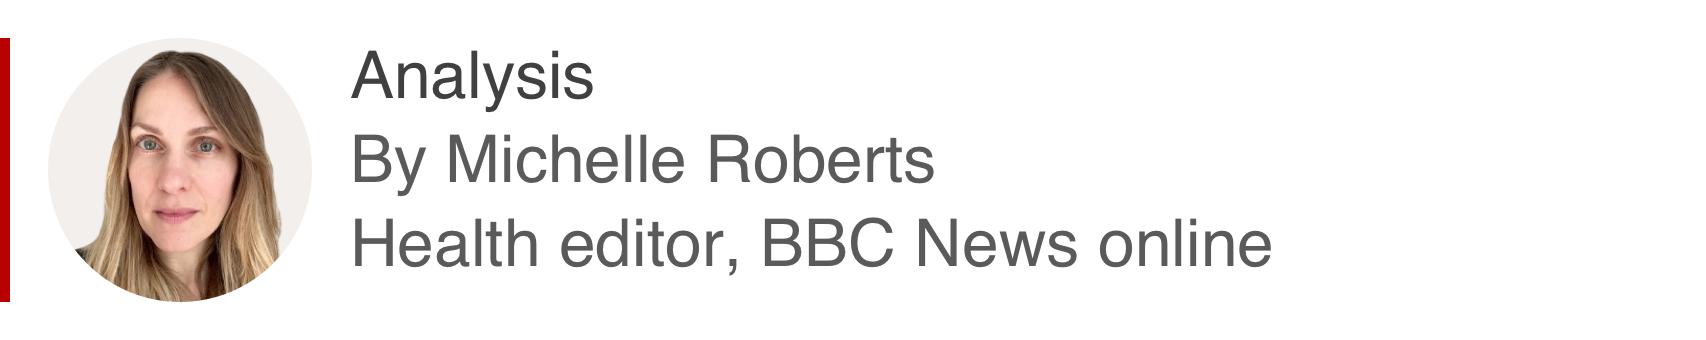 Analysis box by Michelle Roberts, health editor, BBC News online